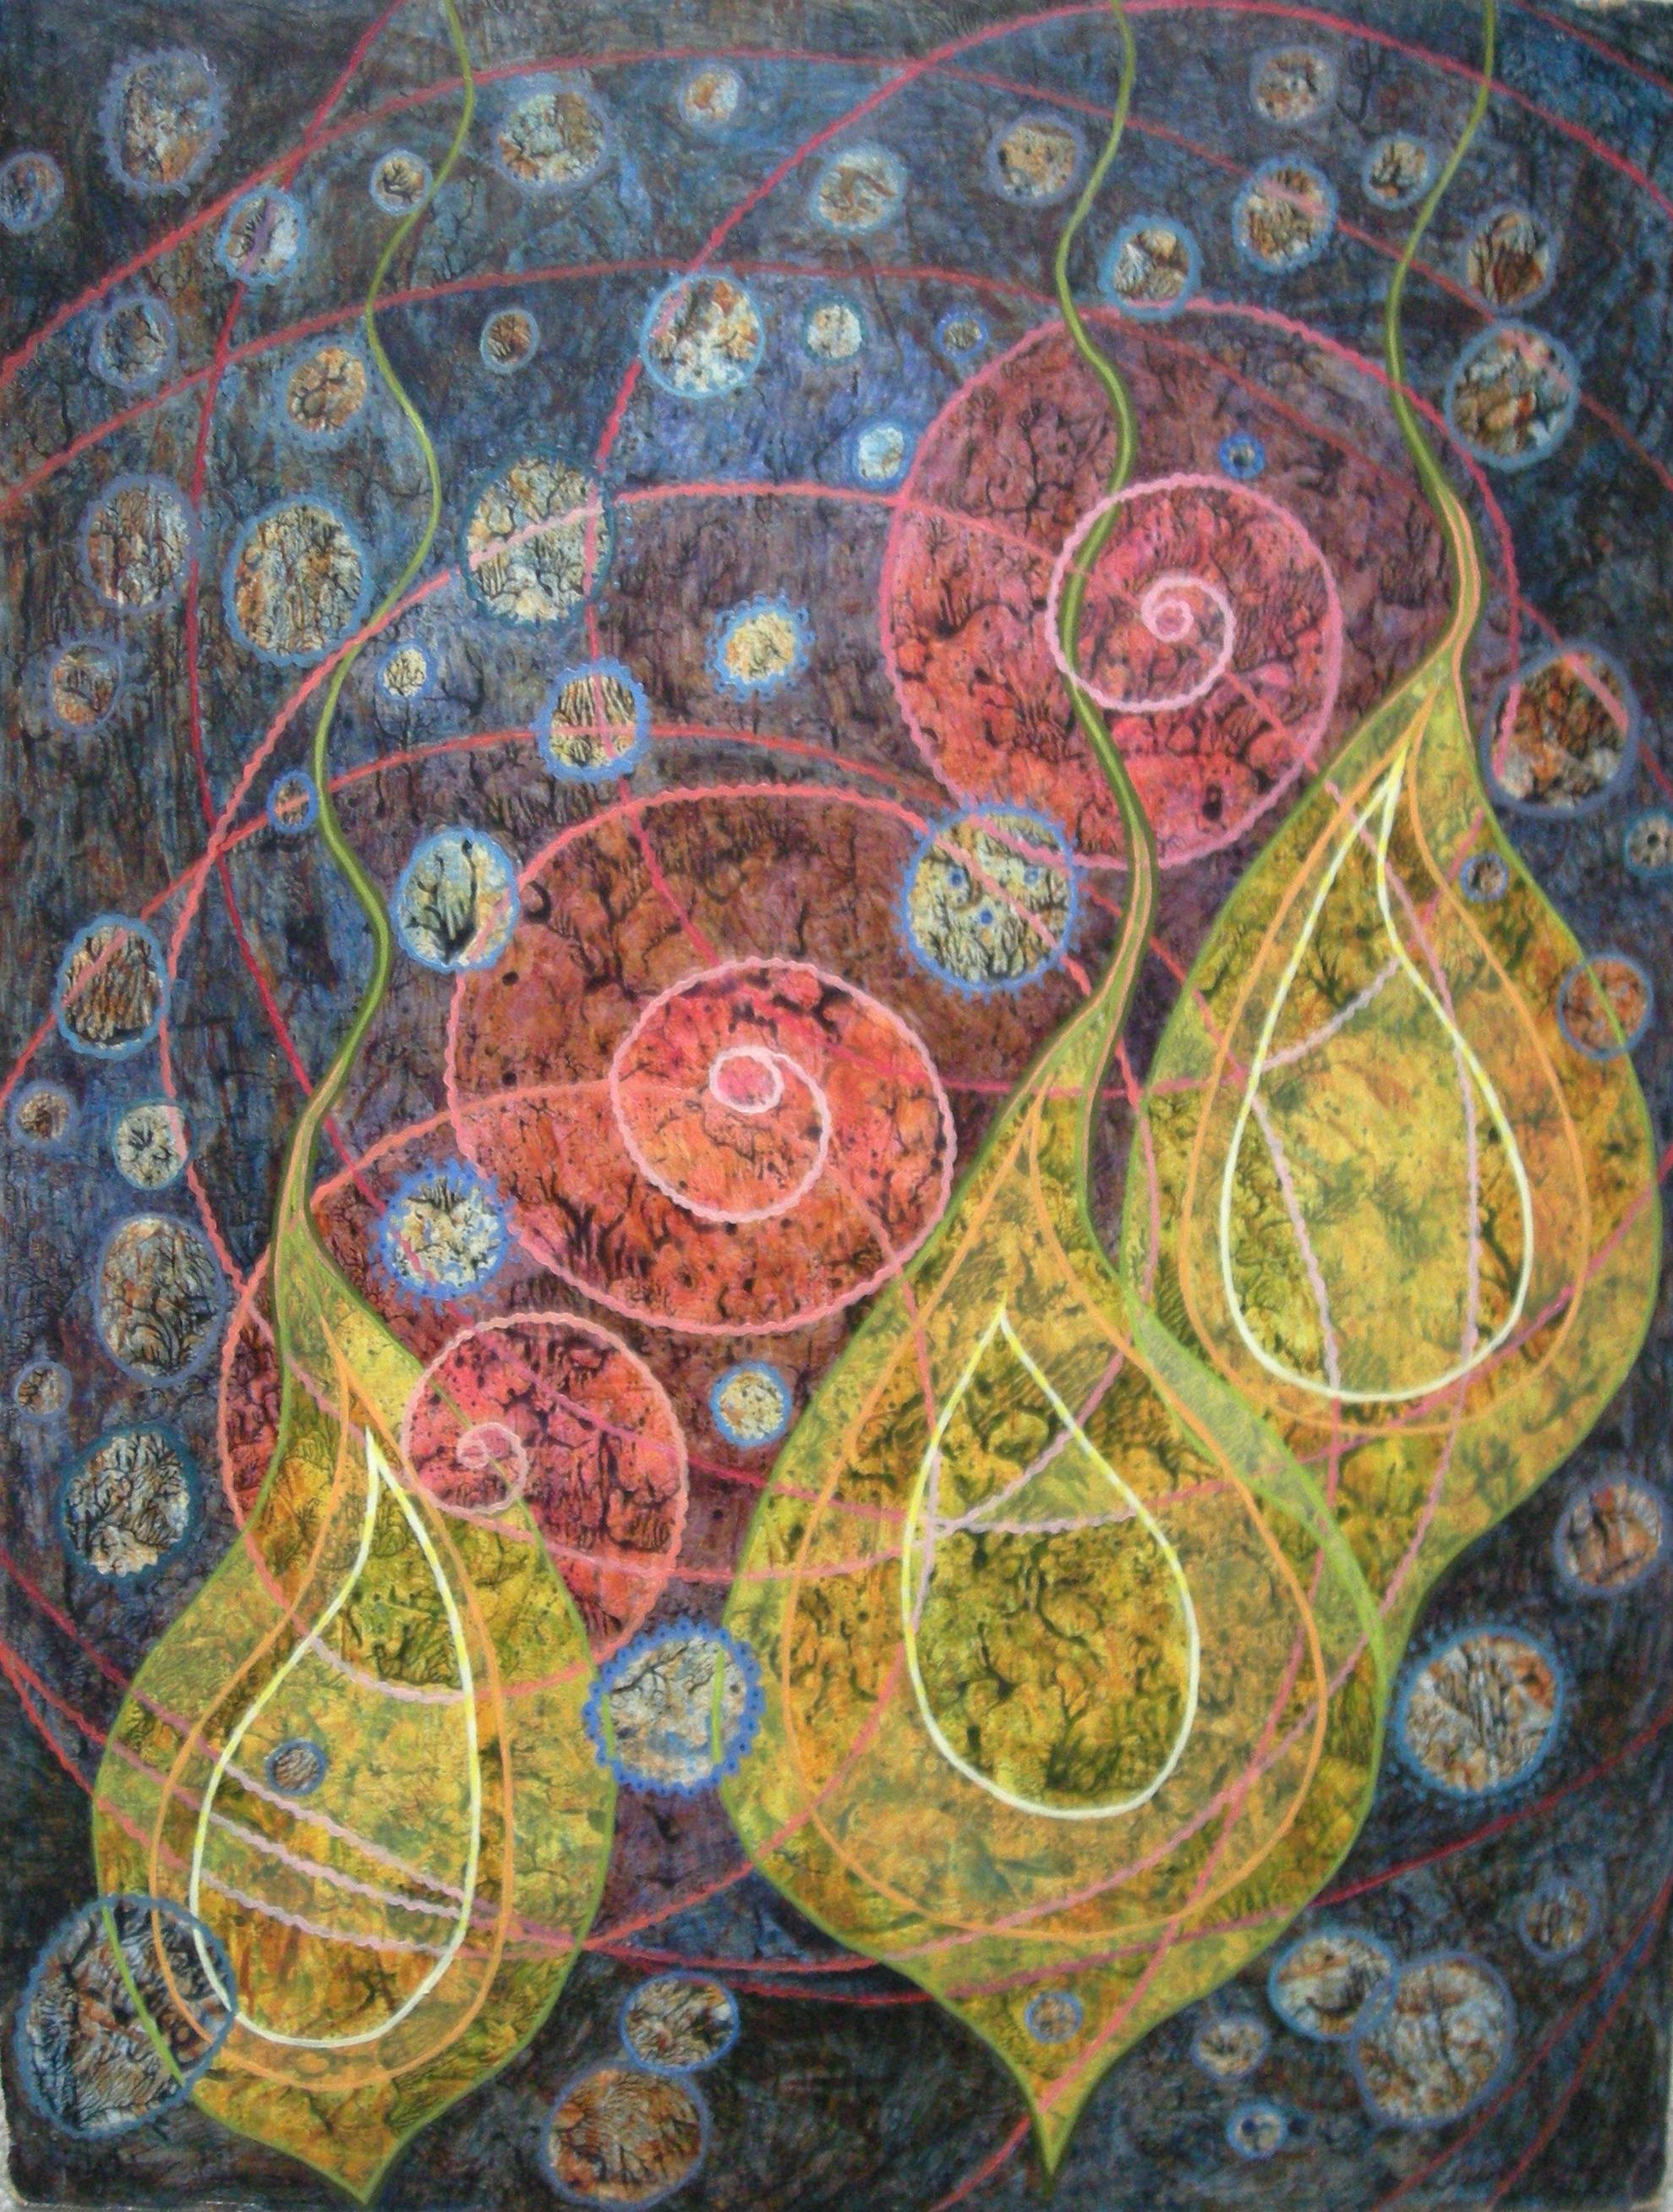 Elvic Steele - Three Modes of Growth